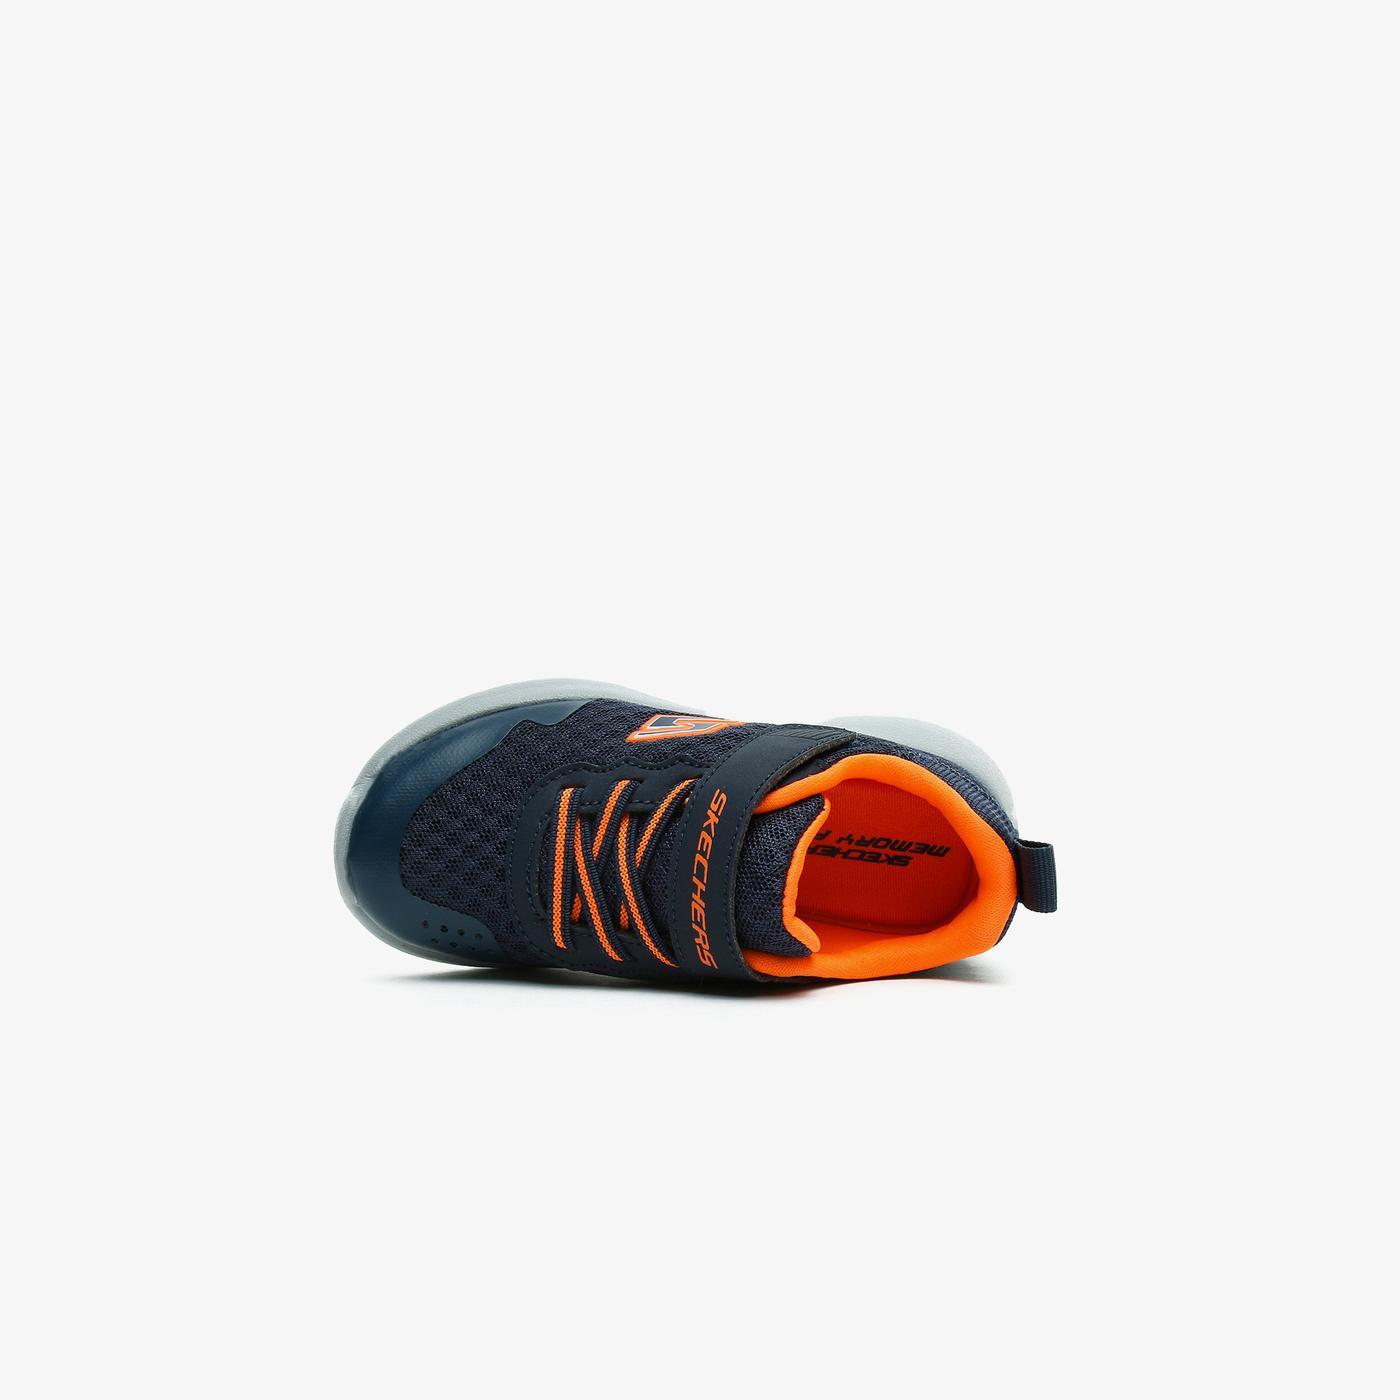 Skechers Dynamight - Hyper Torque Bebek Lacivert Spor Ayakkabı